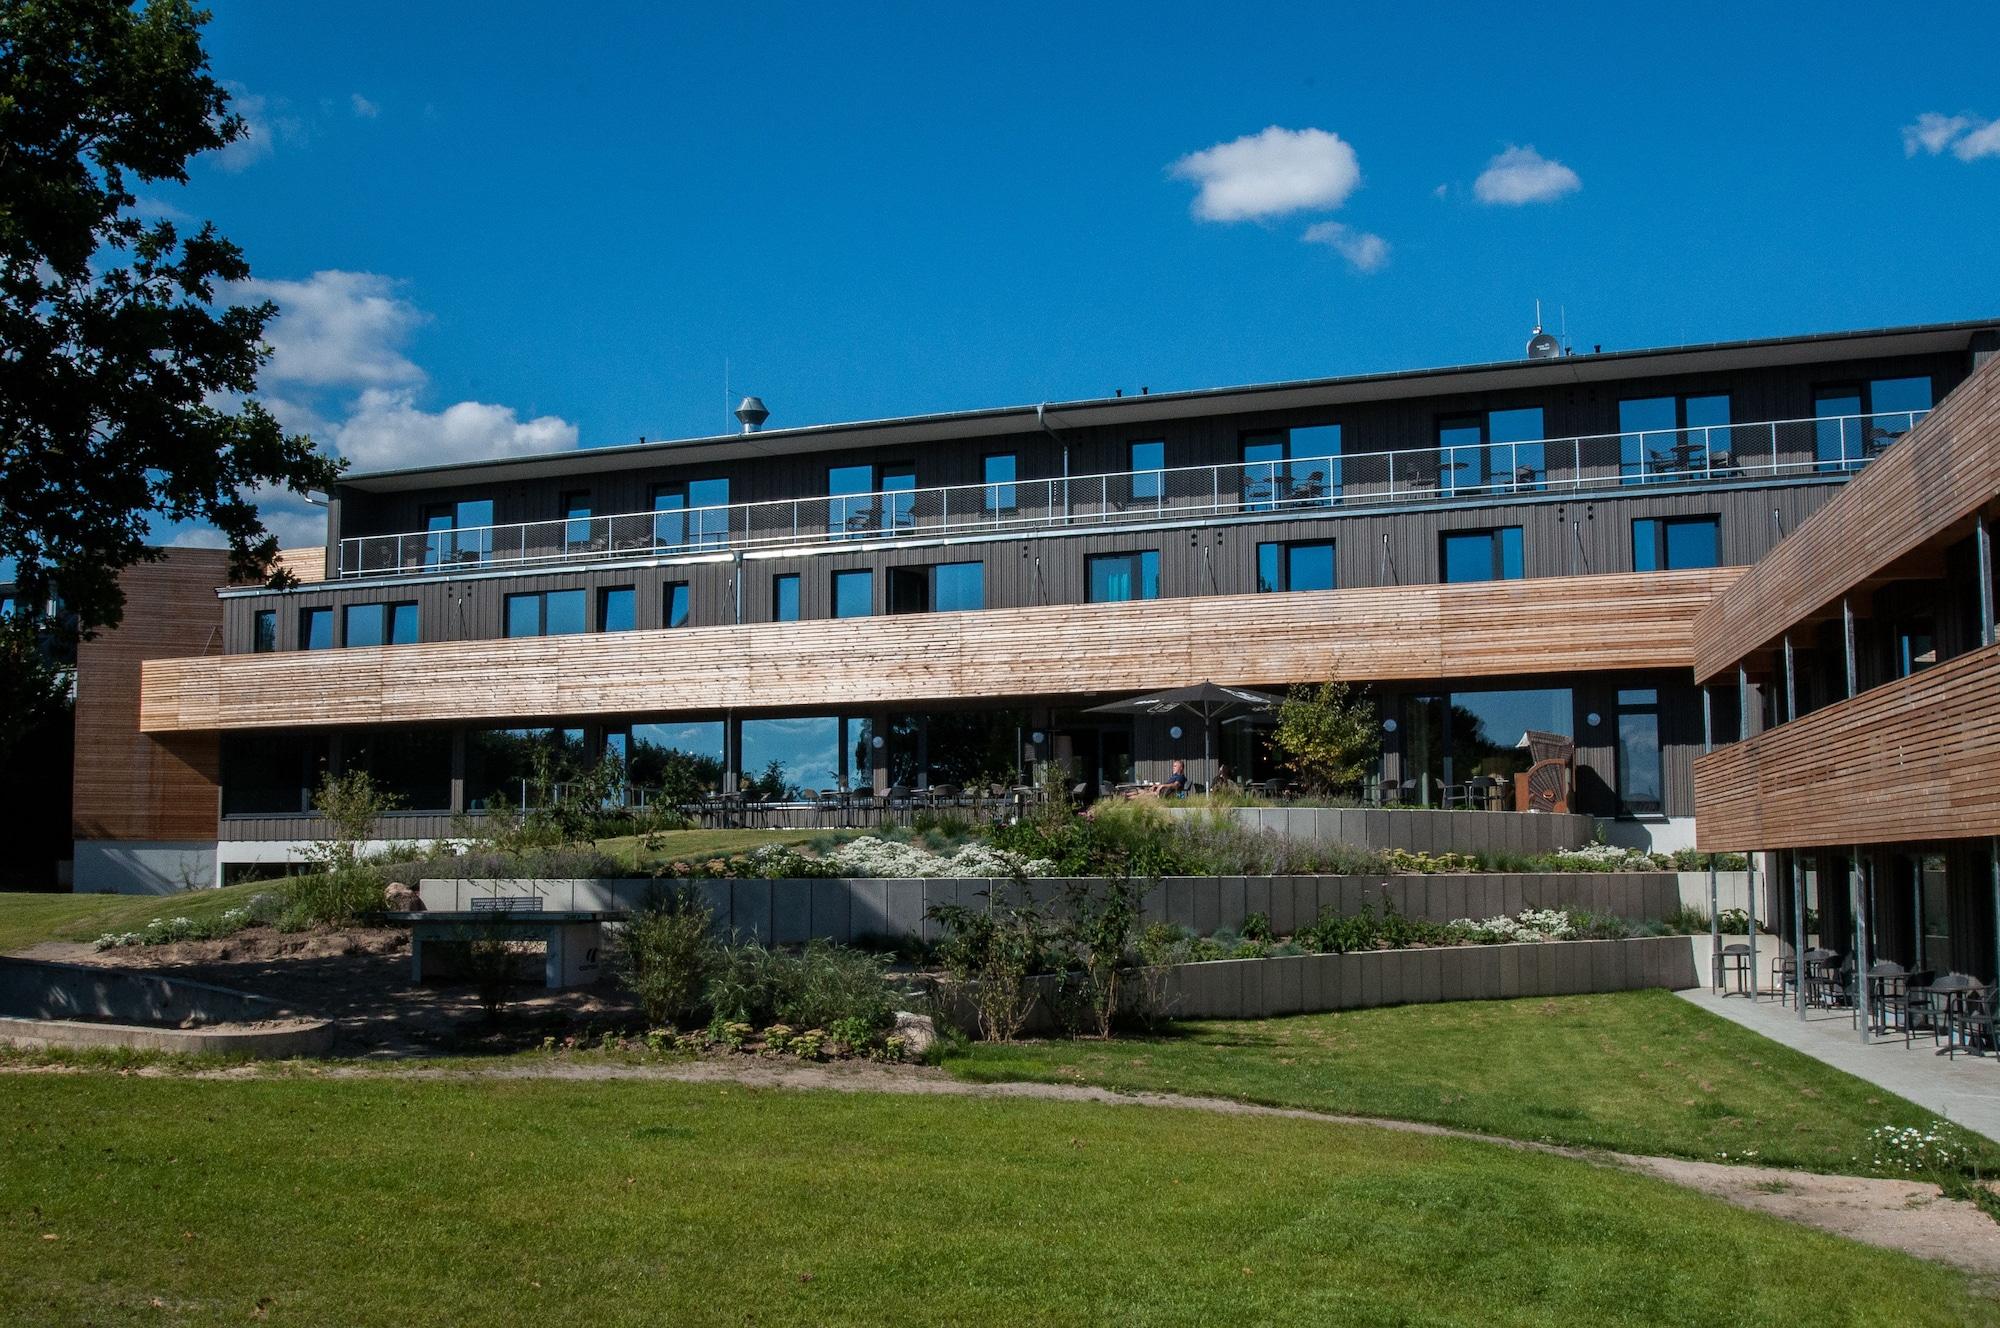 Strandkind - Dein Ostseehotel, Ostholstein